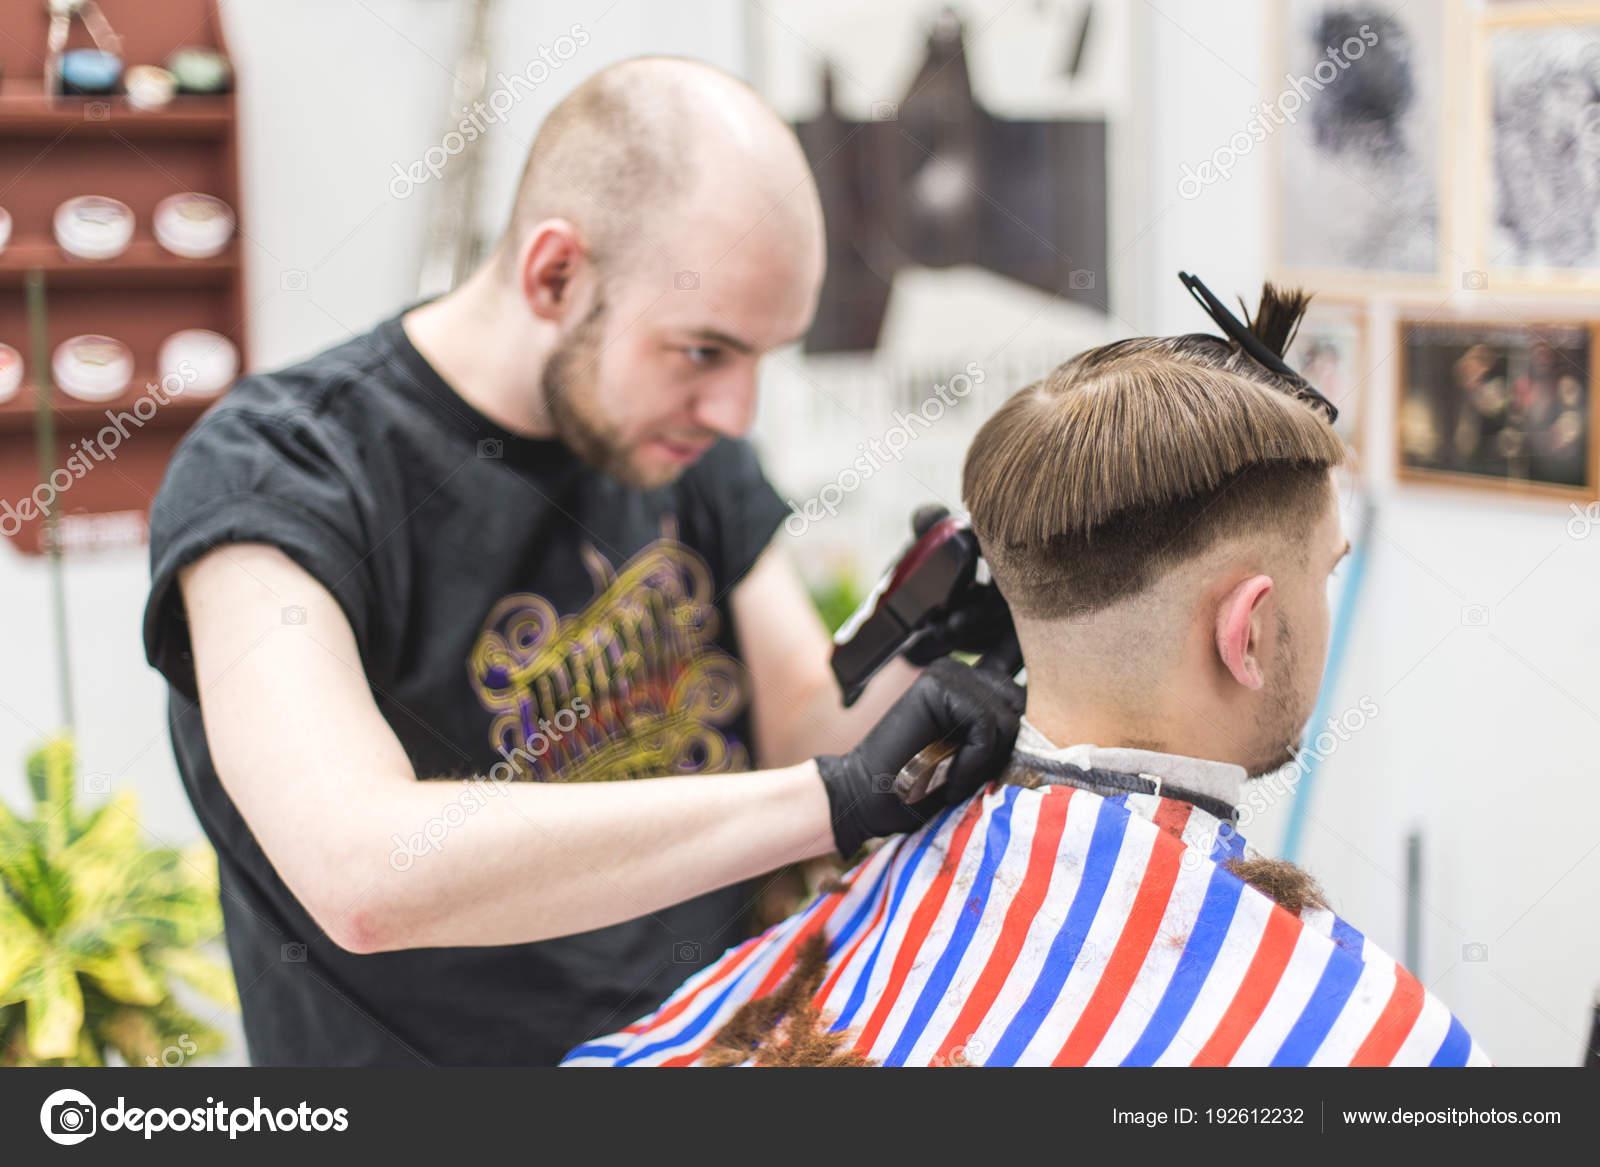 Men Haircut Barbershop Master Barber Does Haircut Client Work